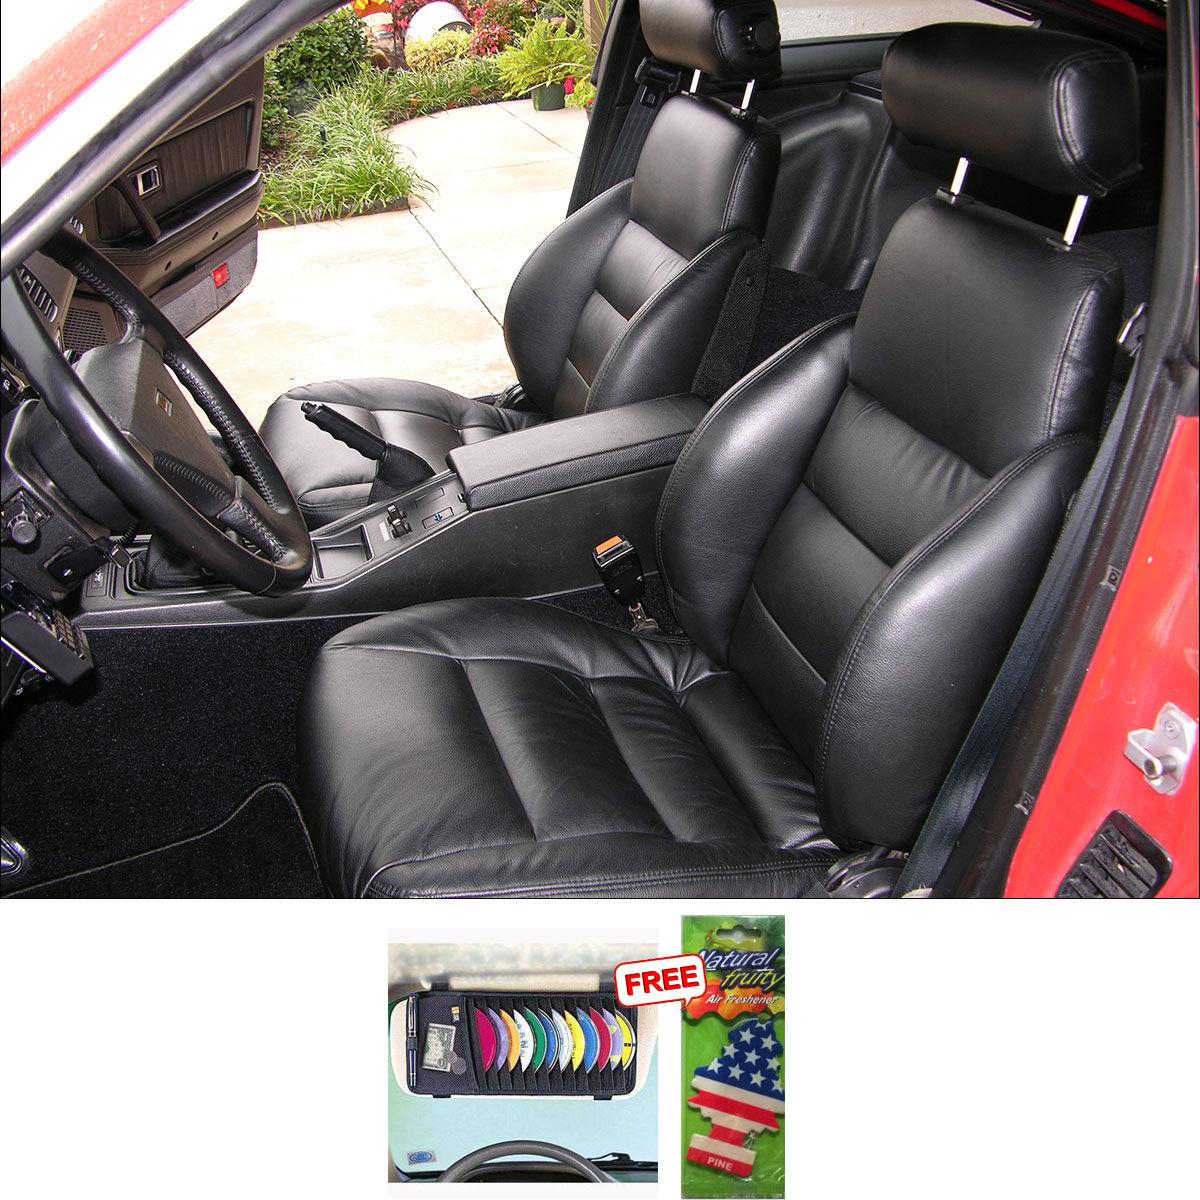 Samsun car seat cover for hyundai santro xing black